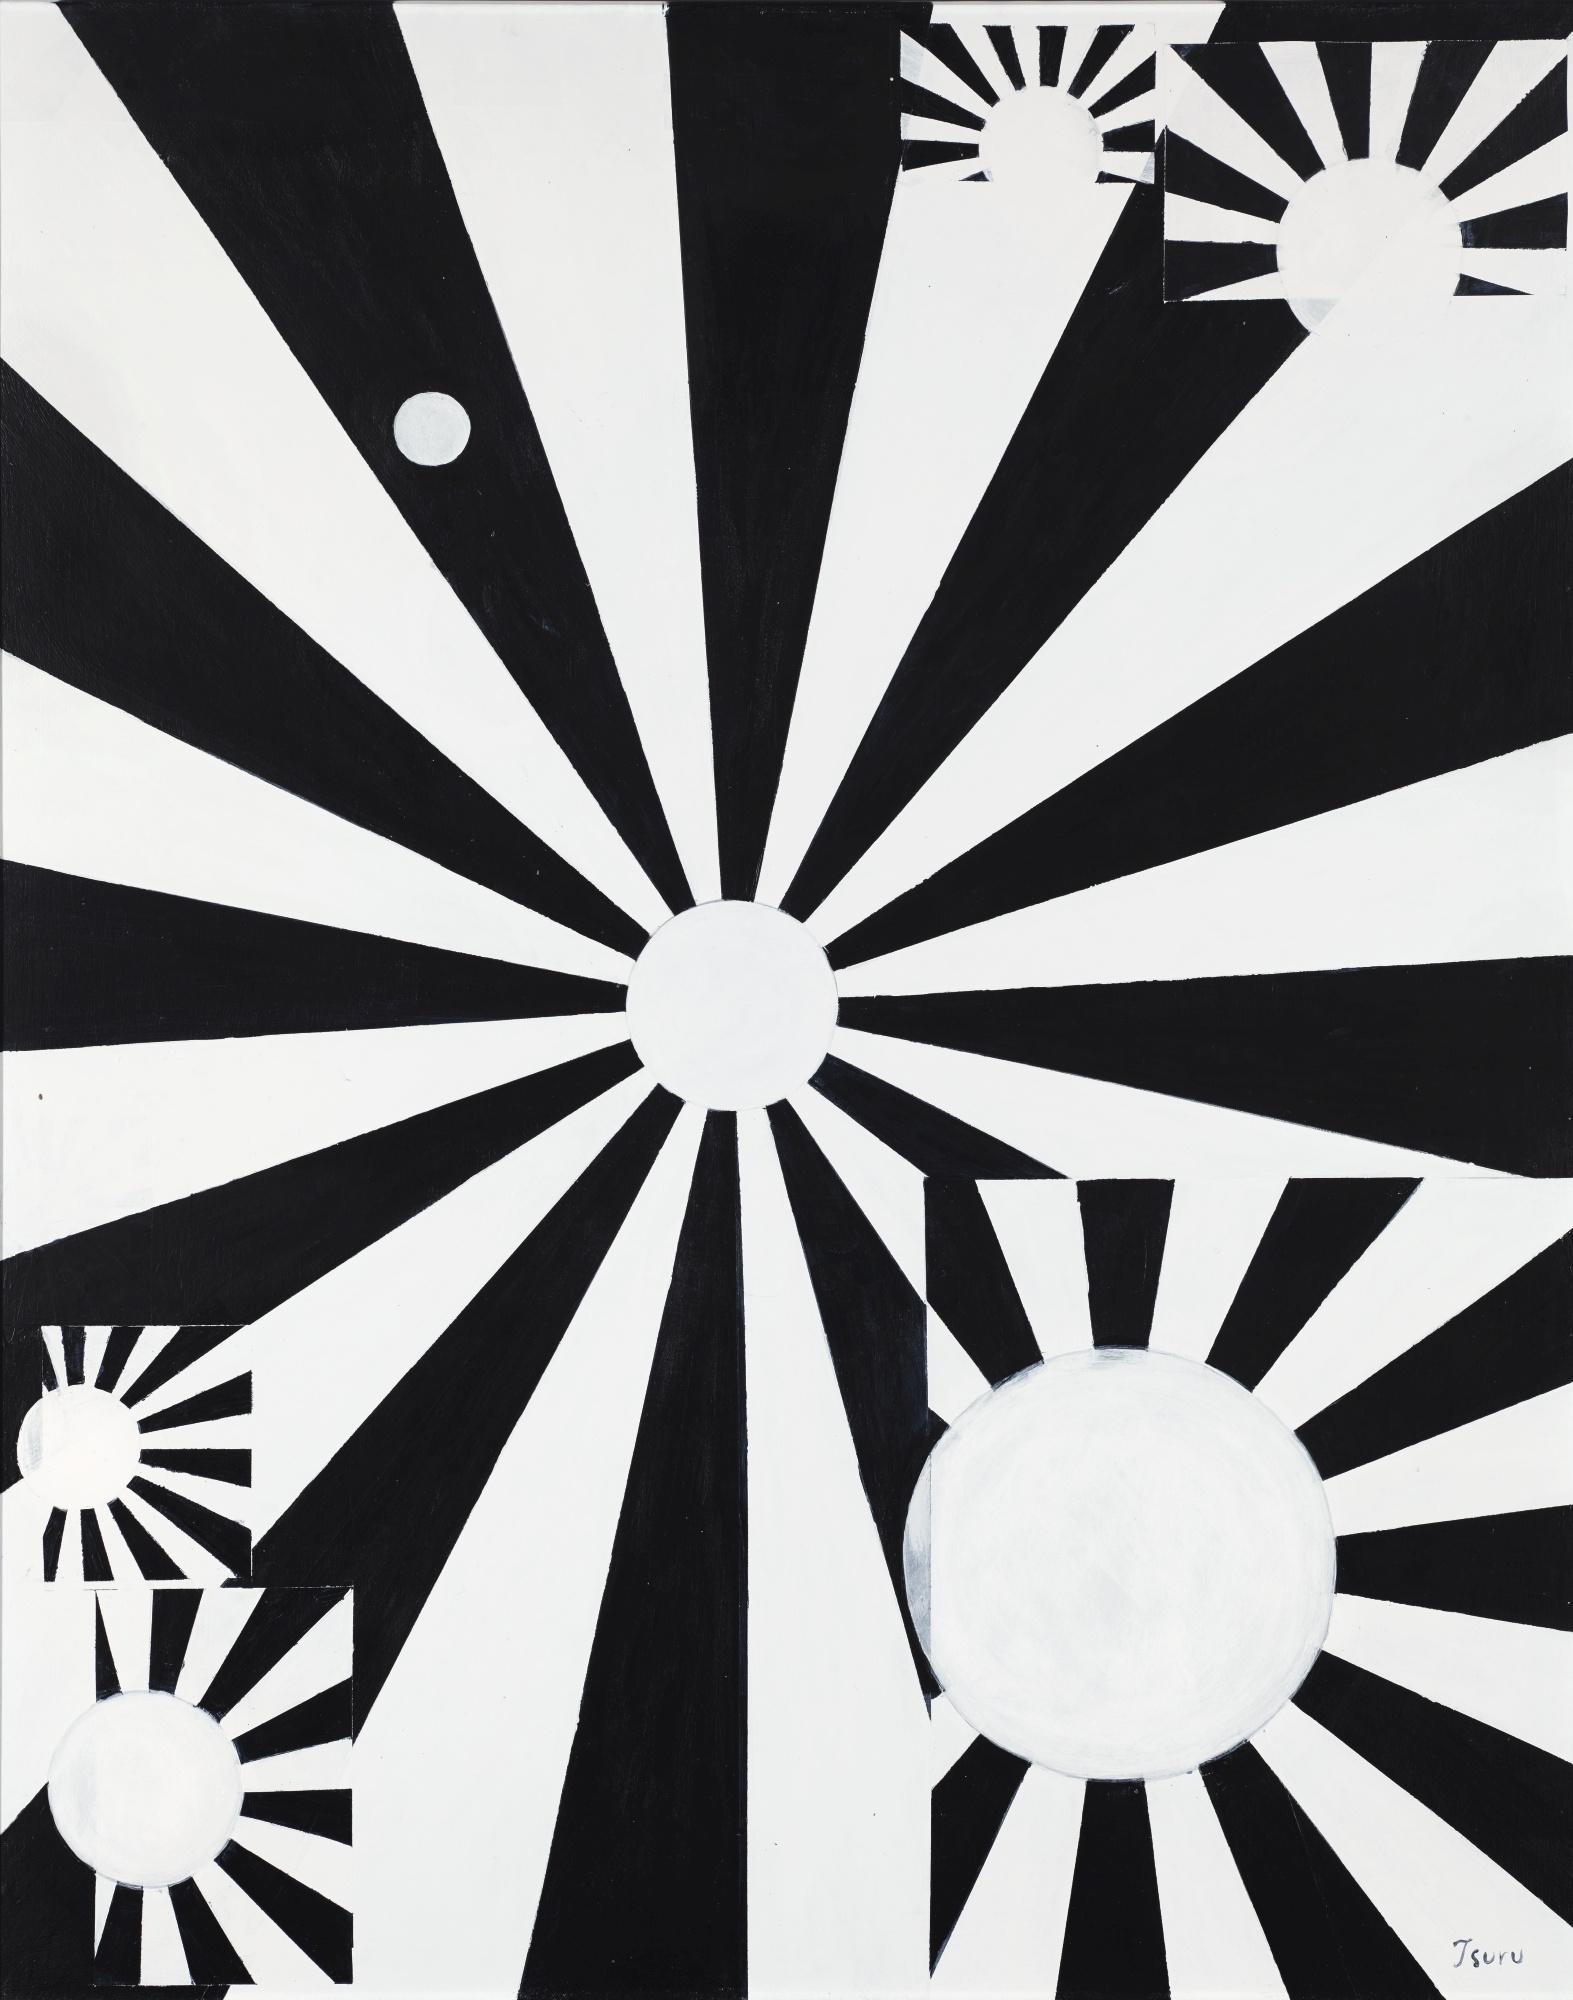 Yamazaki Tsuruko-Untitled-2003